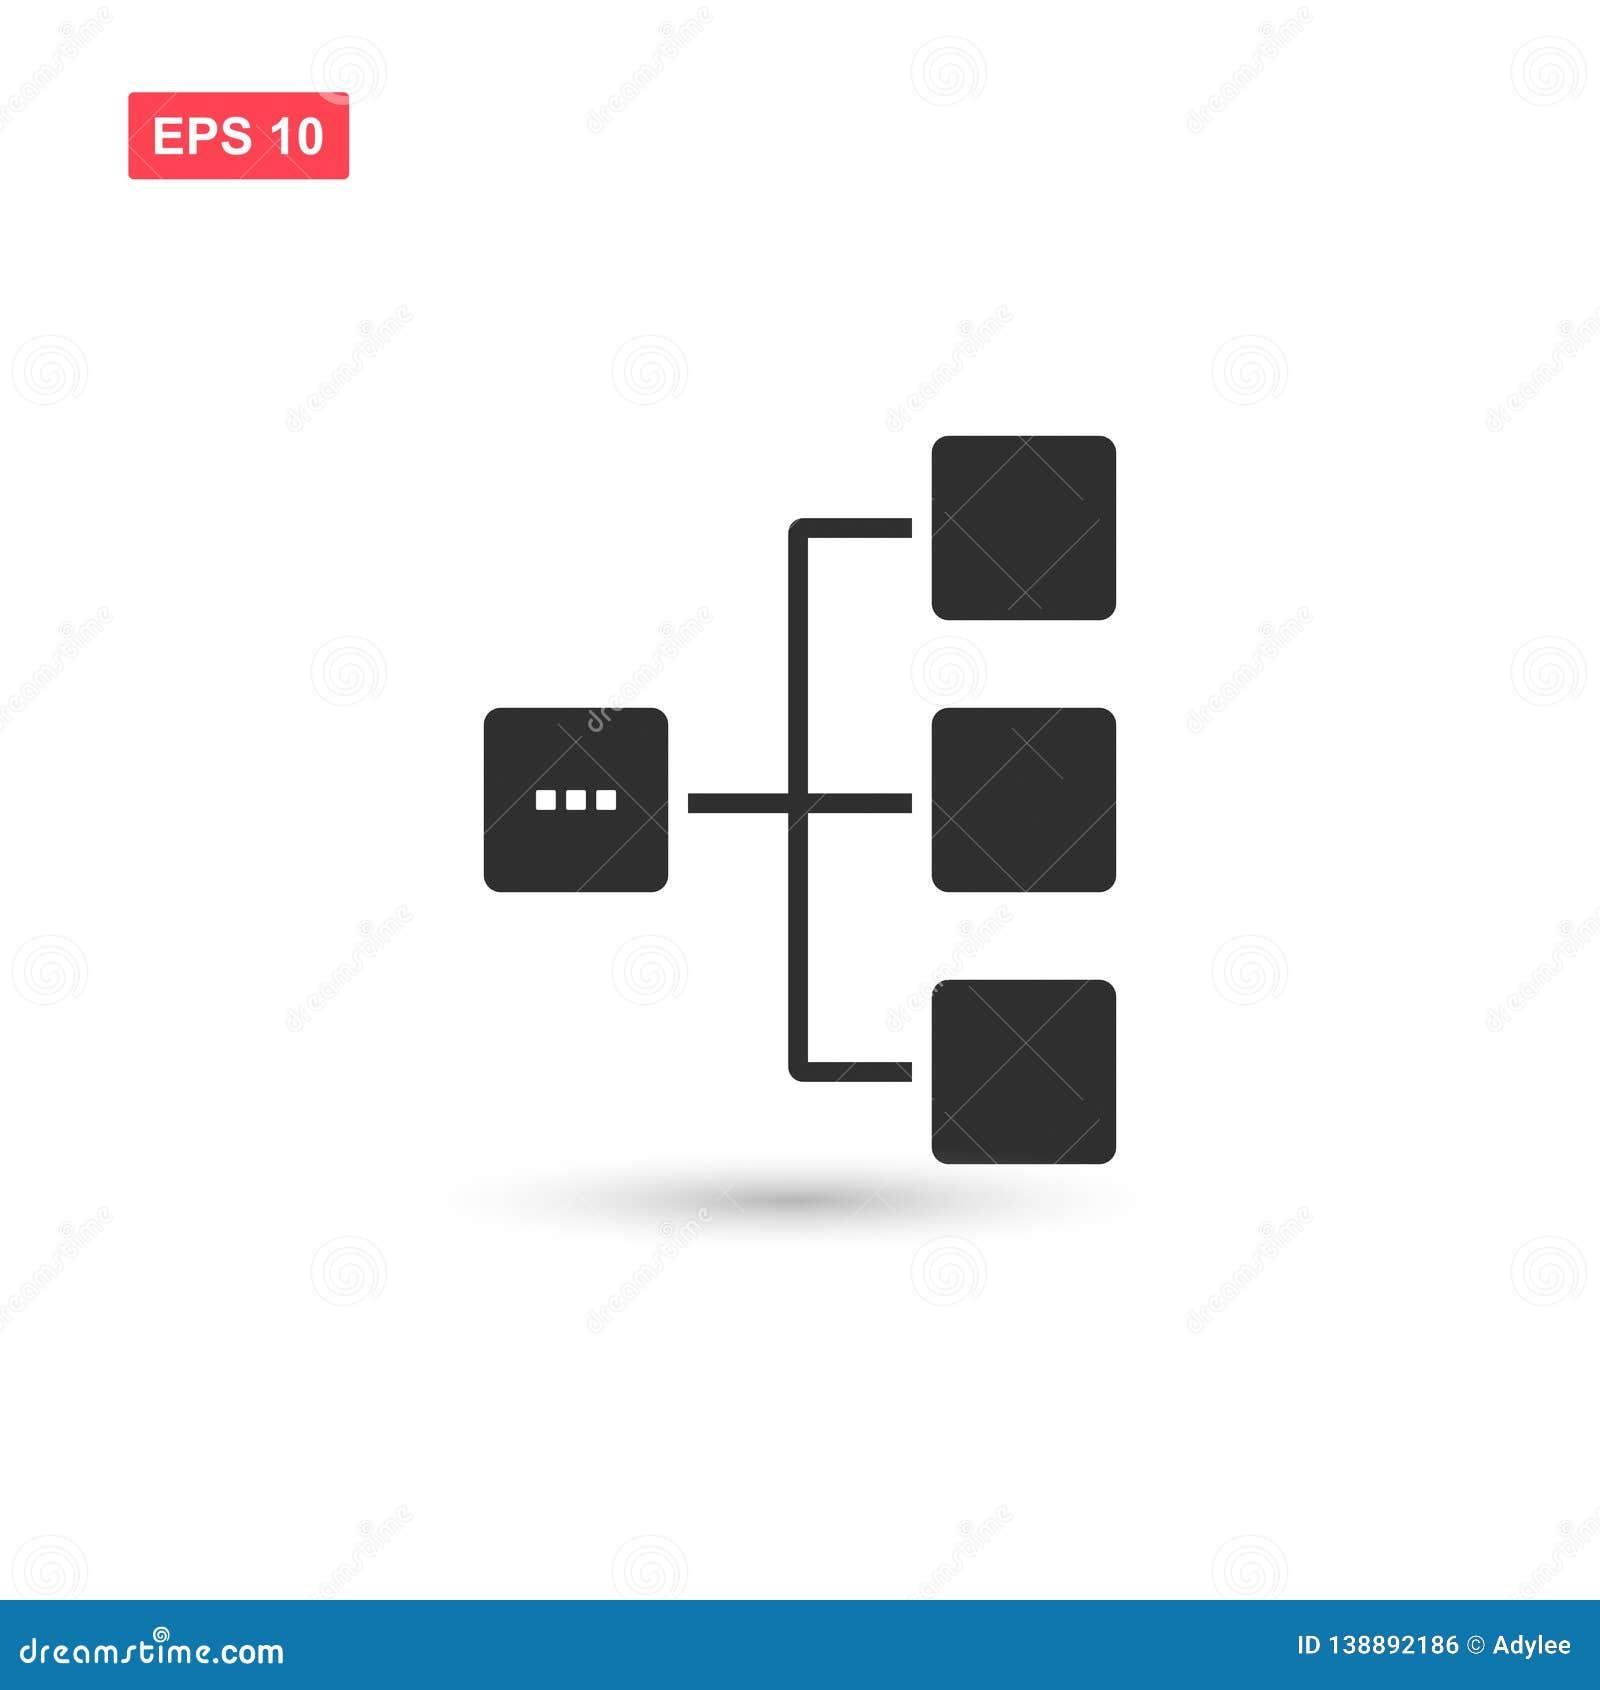 Diagram Icon Vector Design Isolated 3 Stock Vector